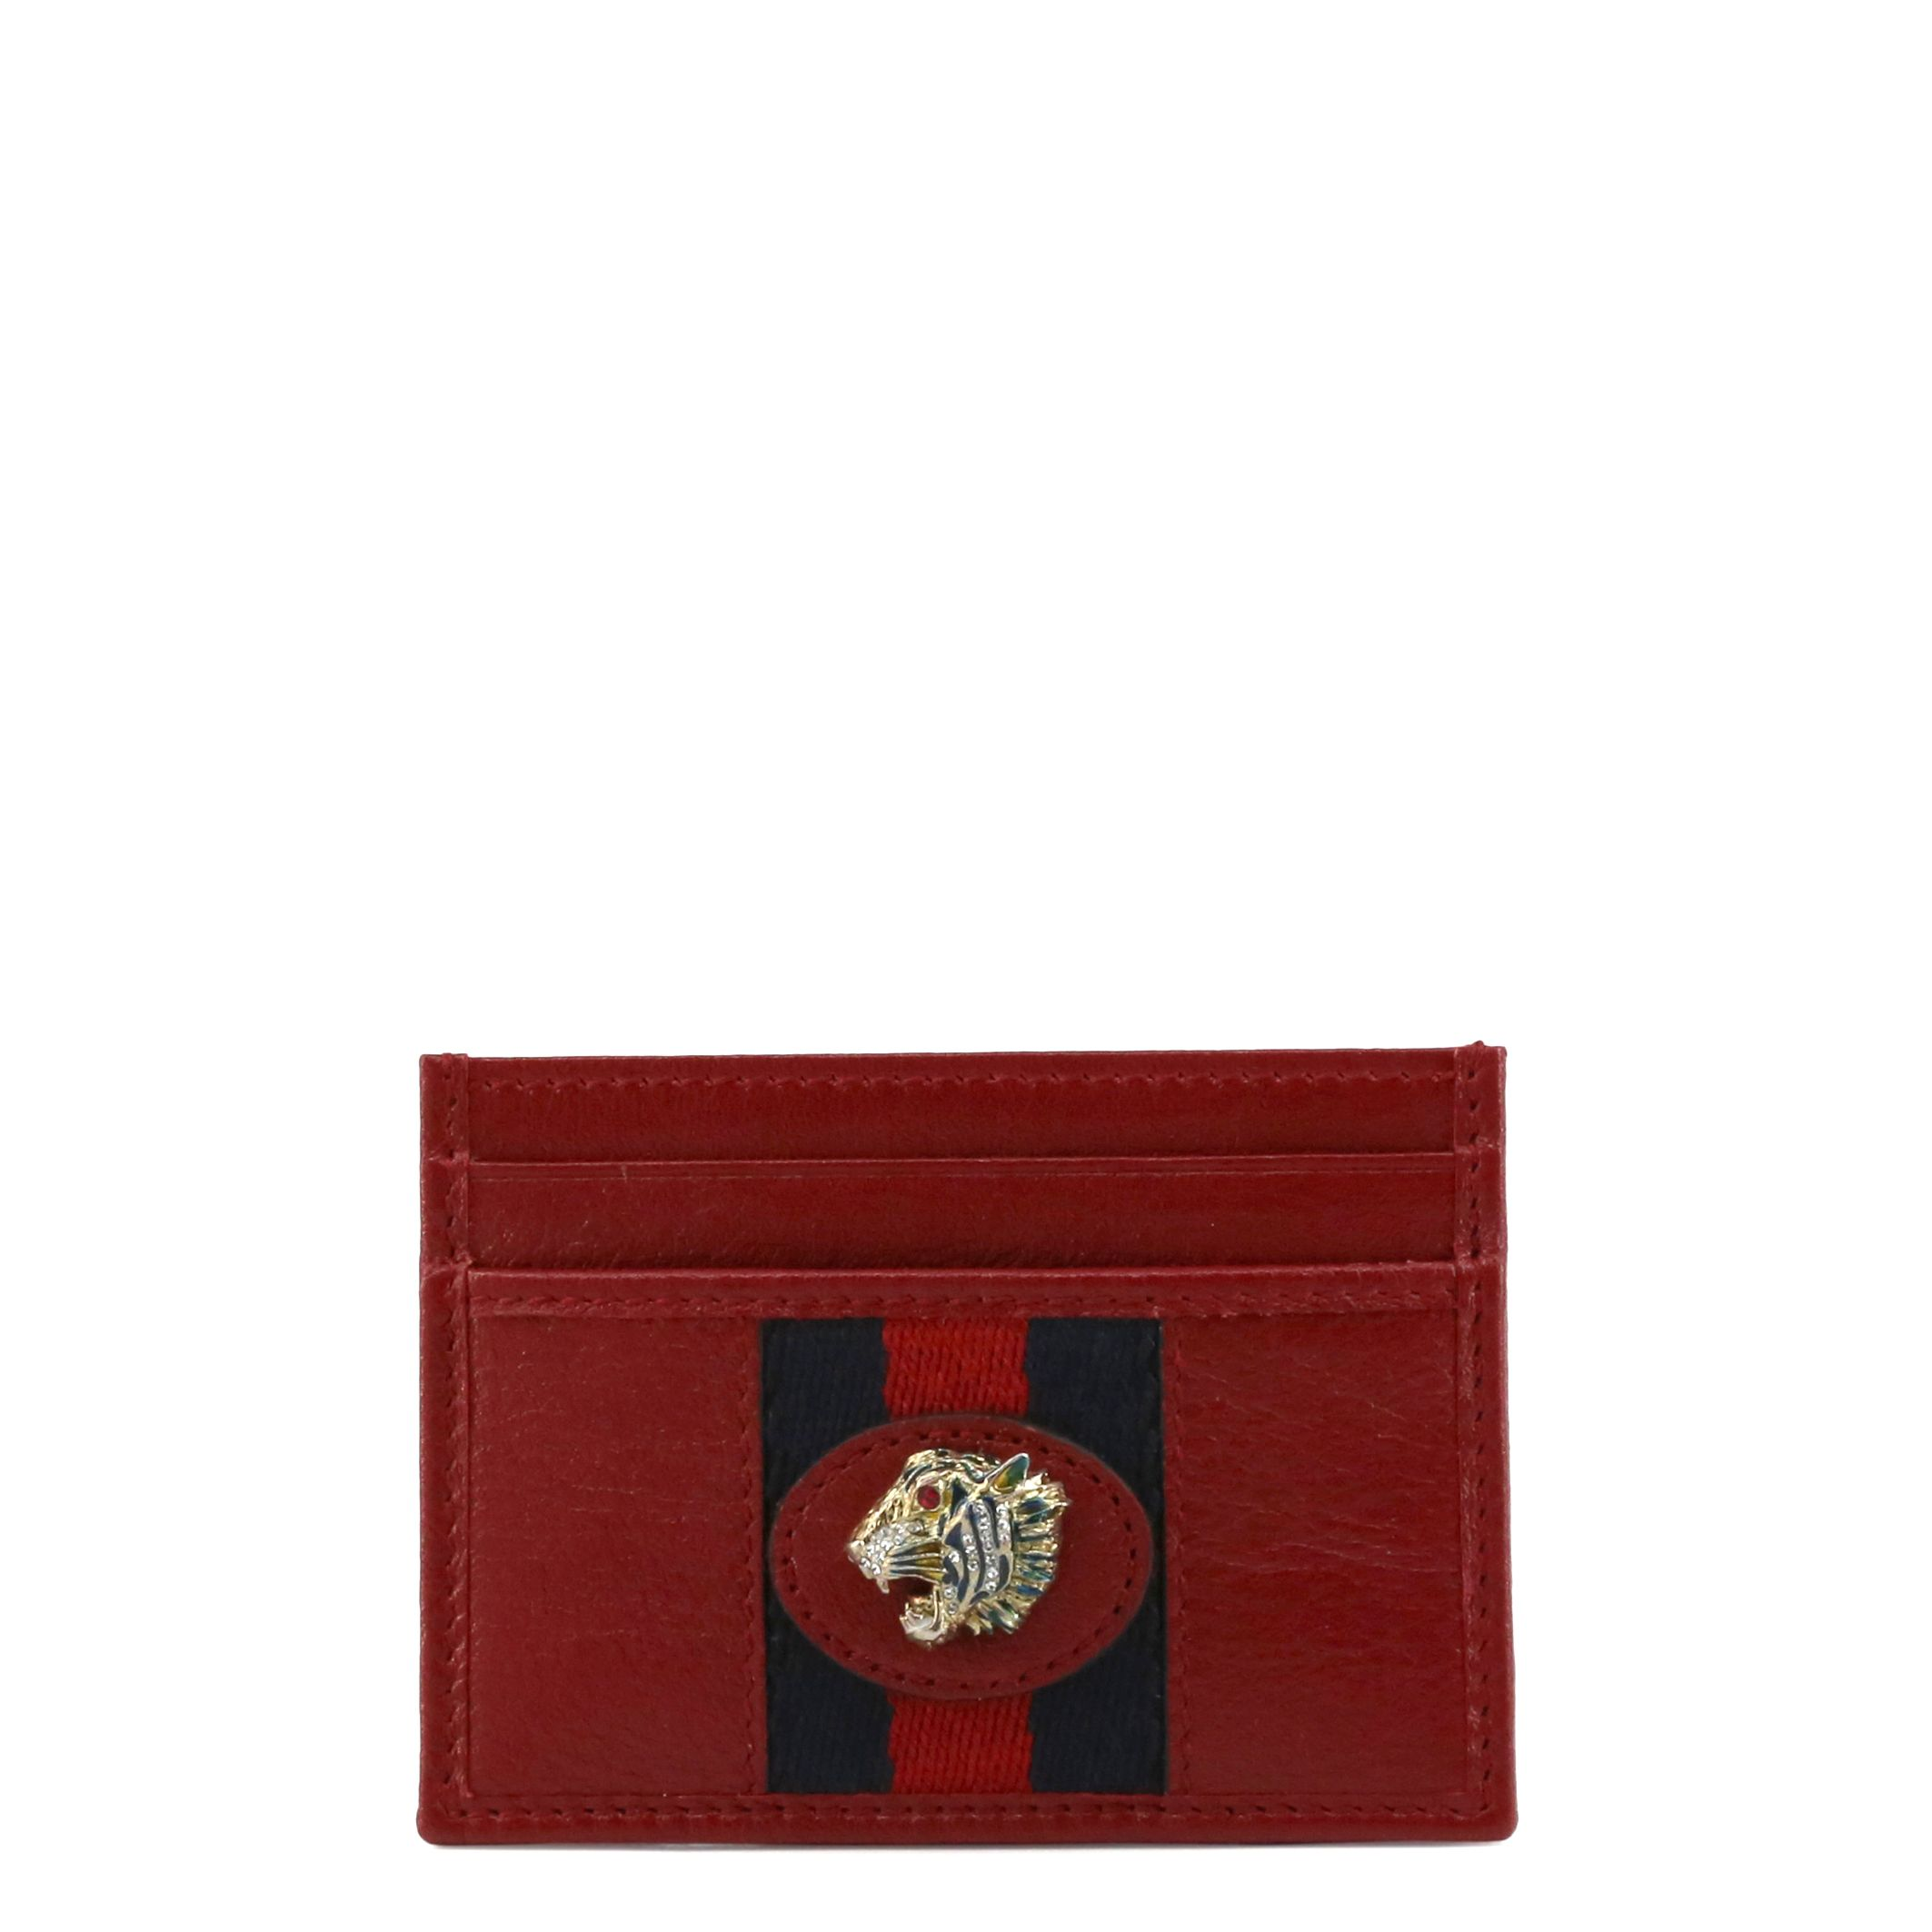 Gucci – 573796_00LHX – Rood Designeritems.nl